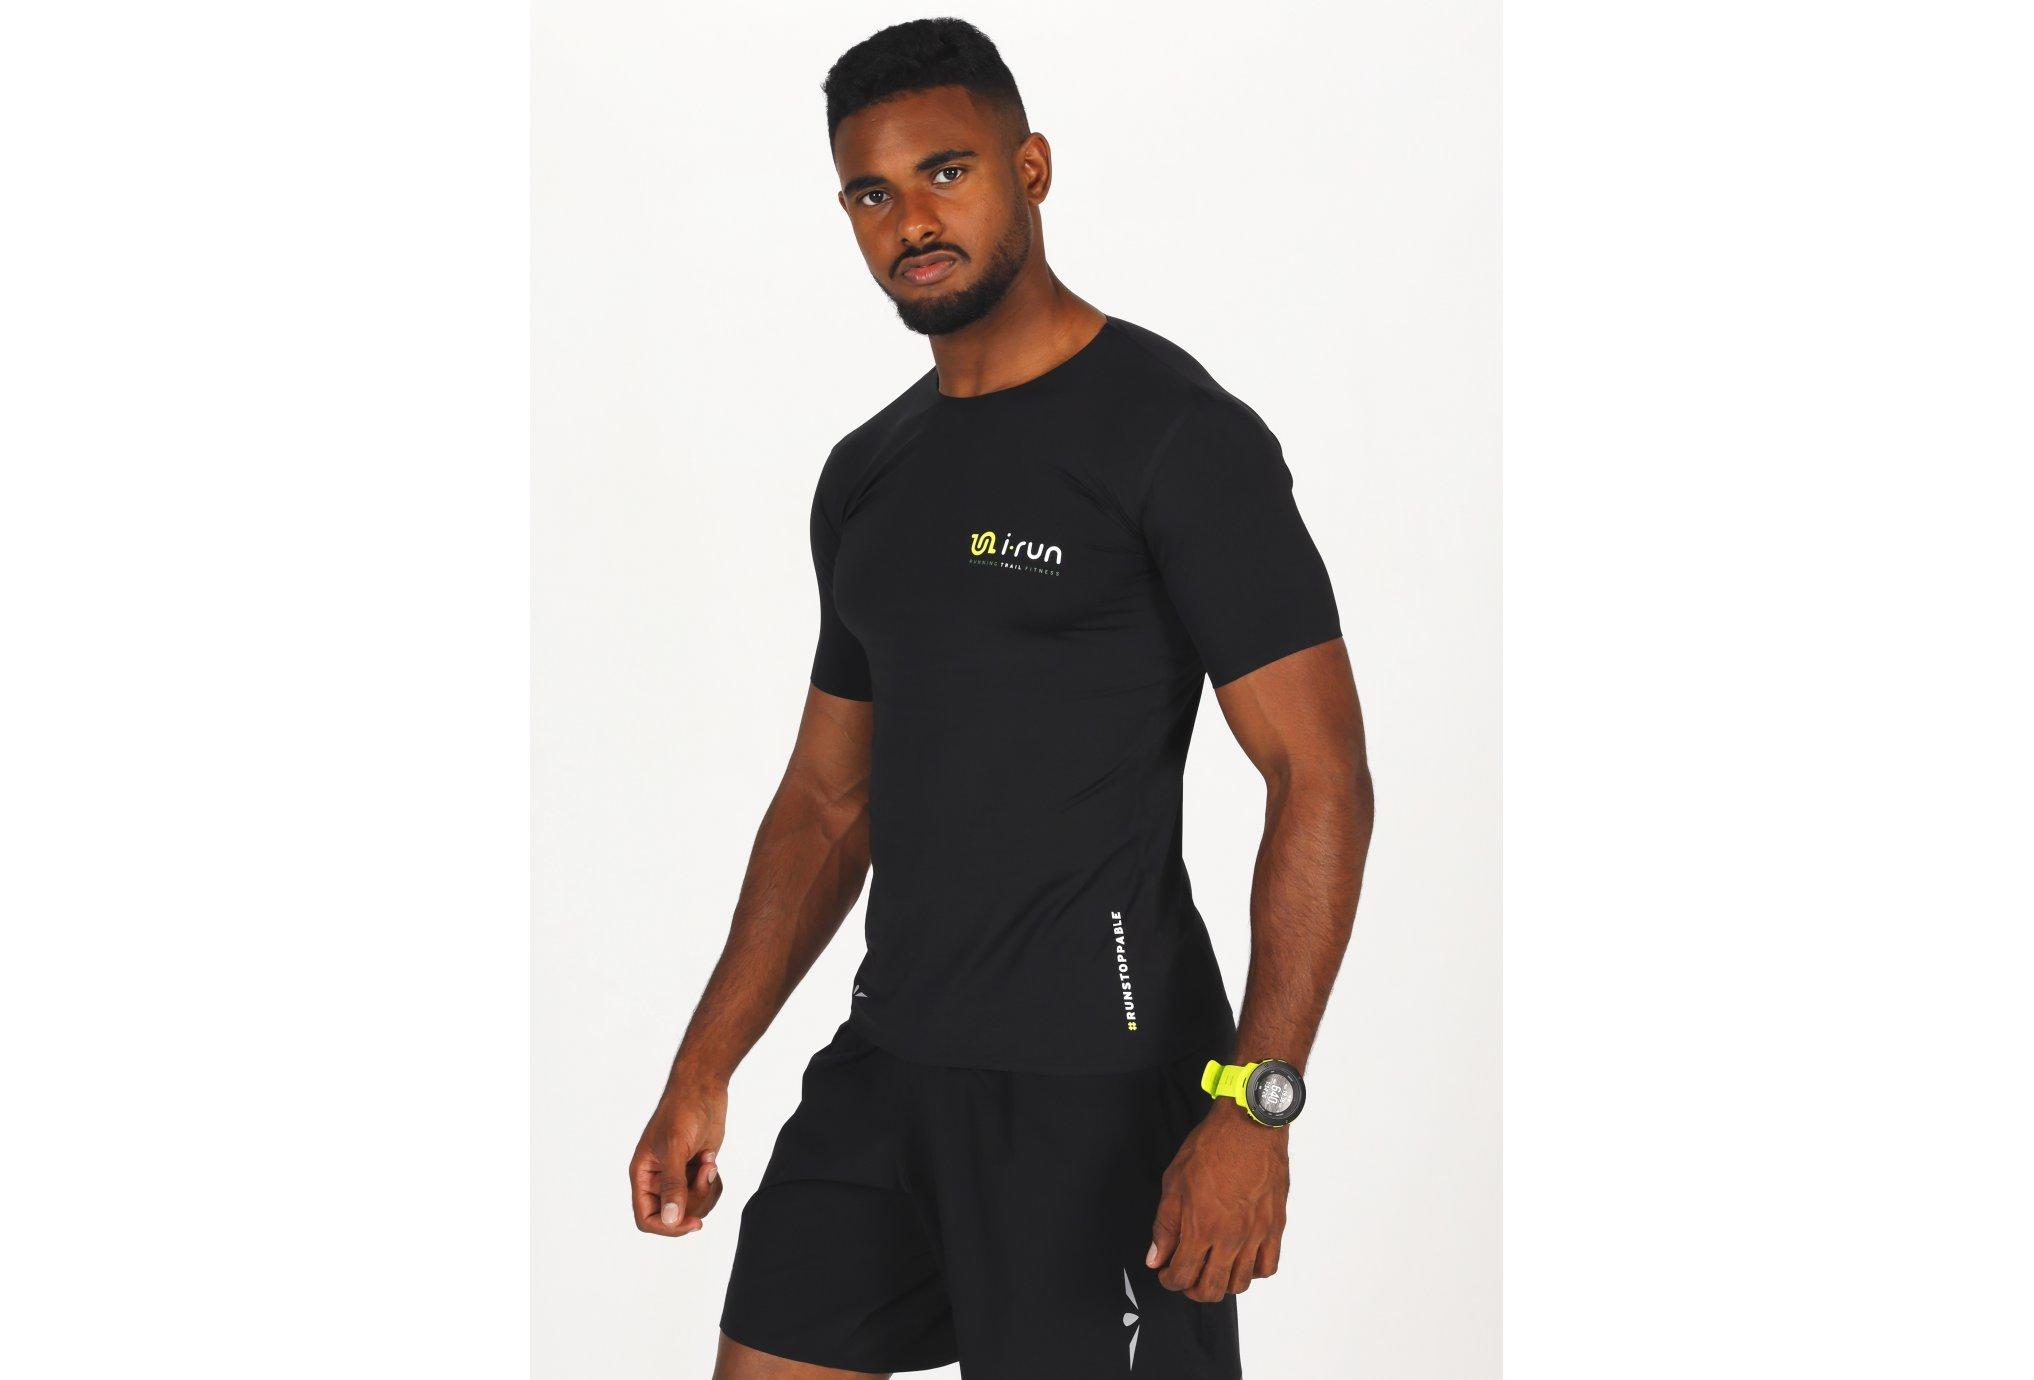 i-run.fr Base Special i-Run M Diététique Vêtements homme